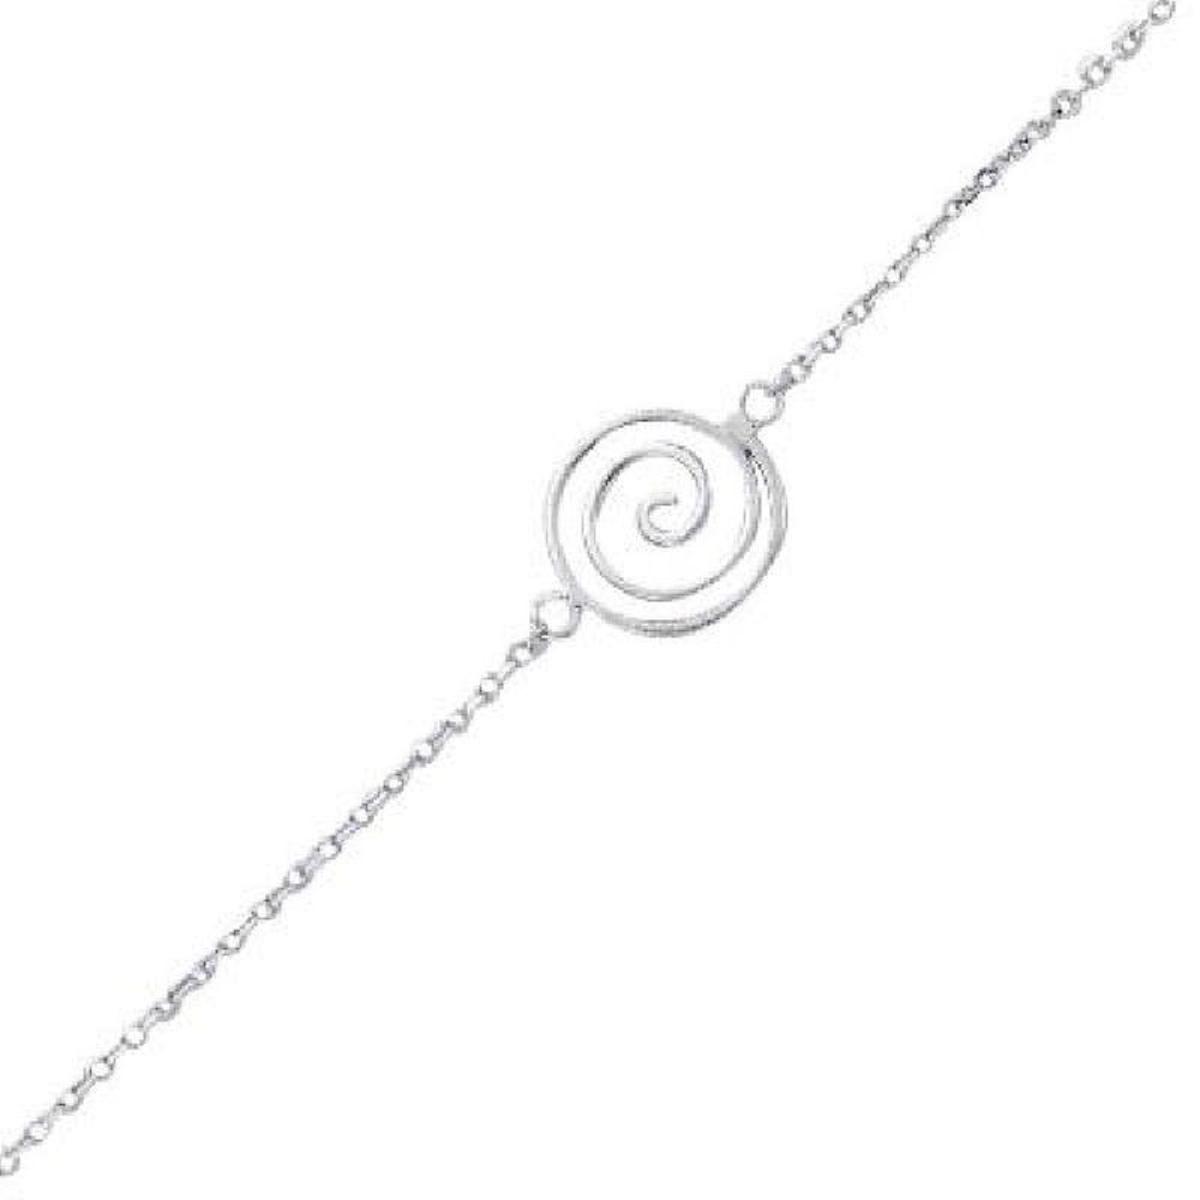 Bracelet 17+2 cm Spirale Argent 925